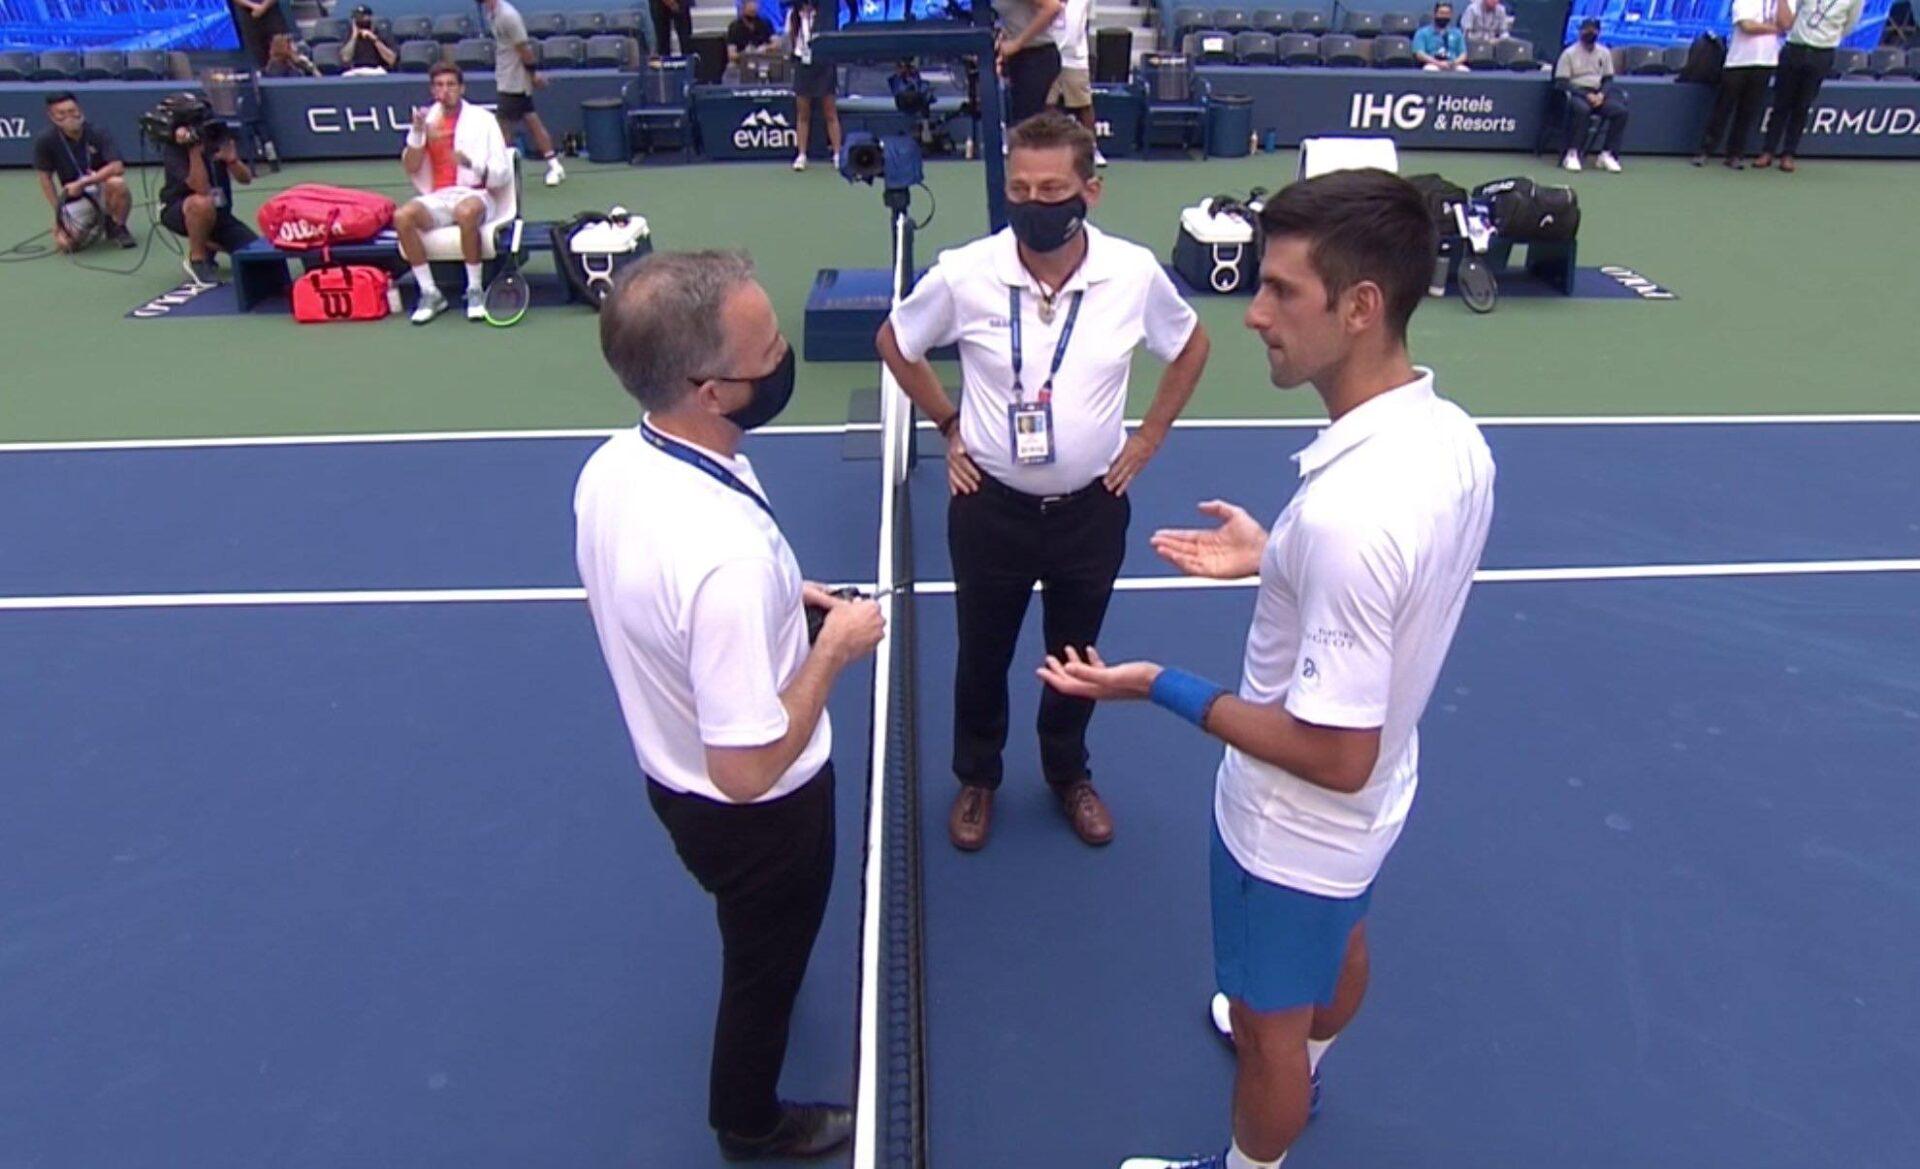 US Open, Djokovic